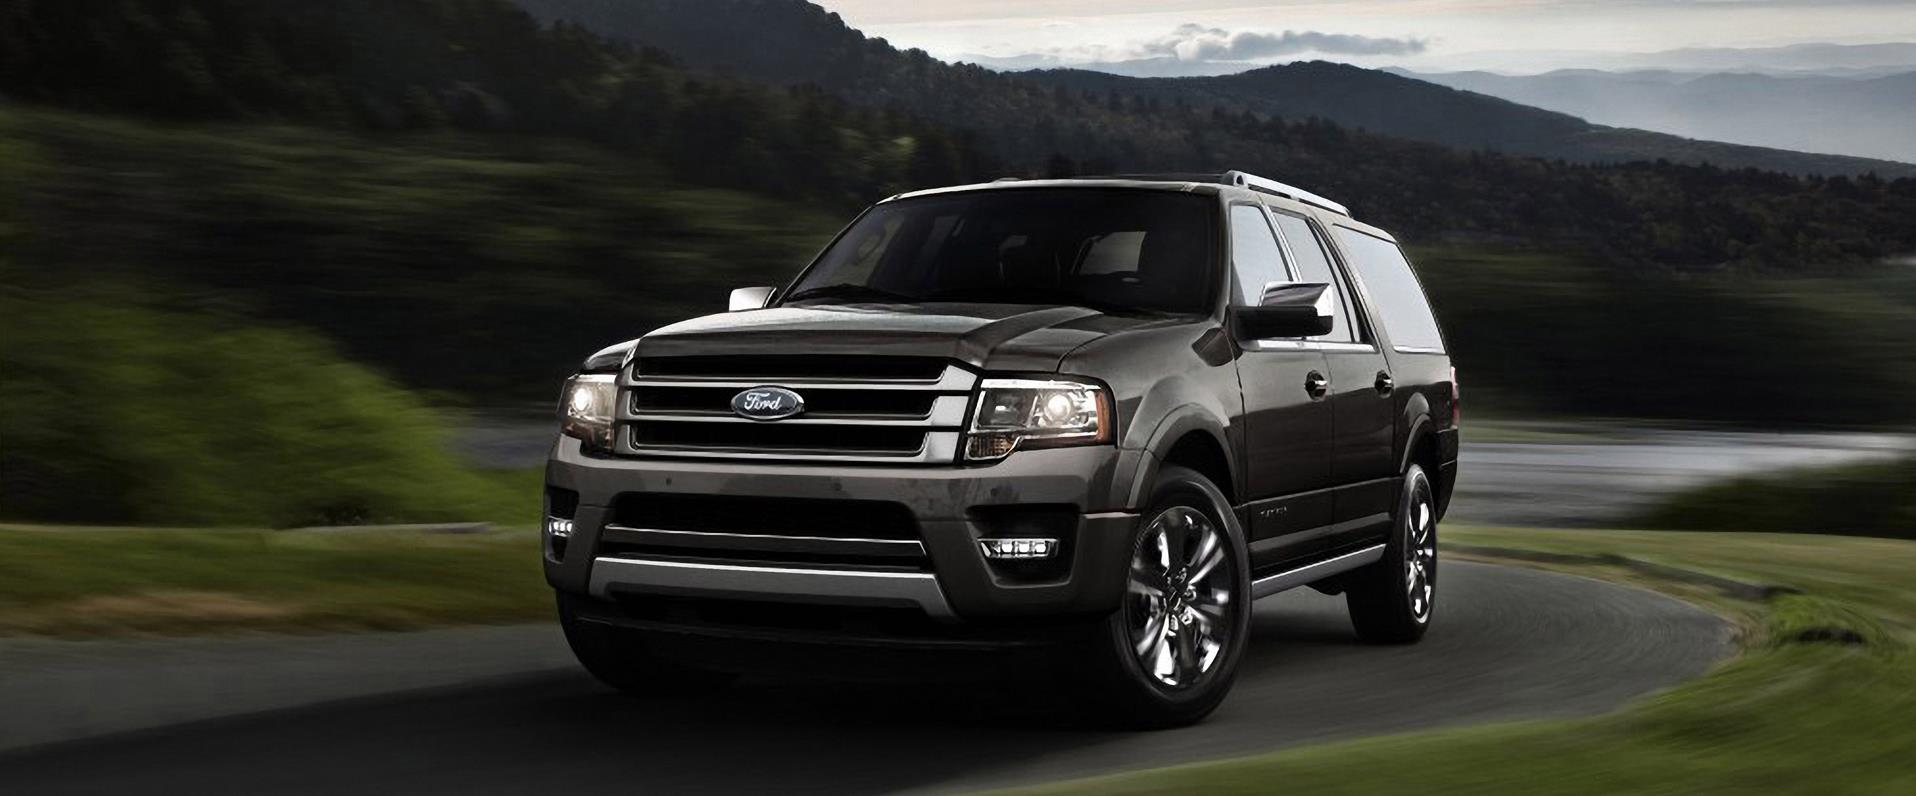 Wheels And Deals Atlanta GA | New & Used Cars Trucks Sales